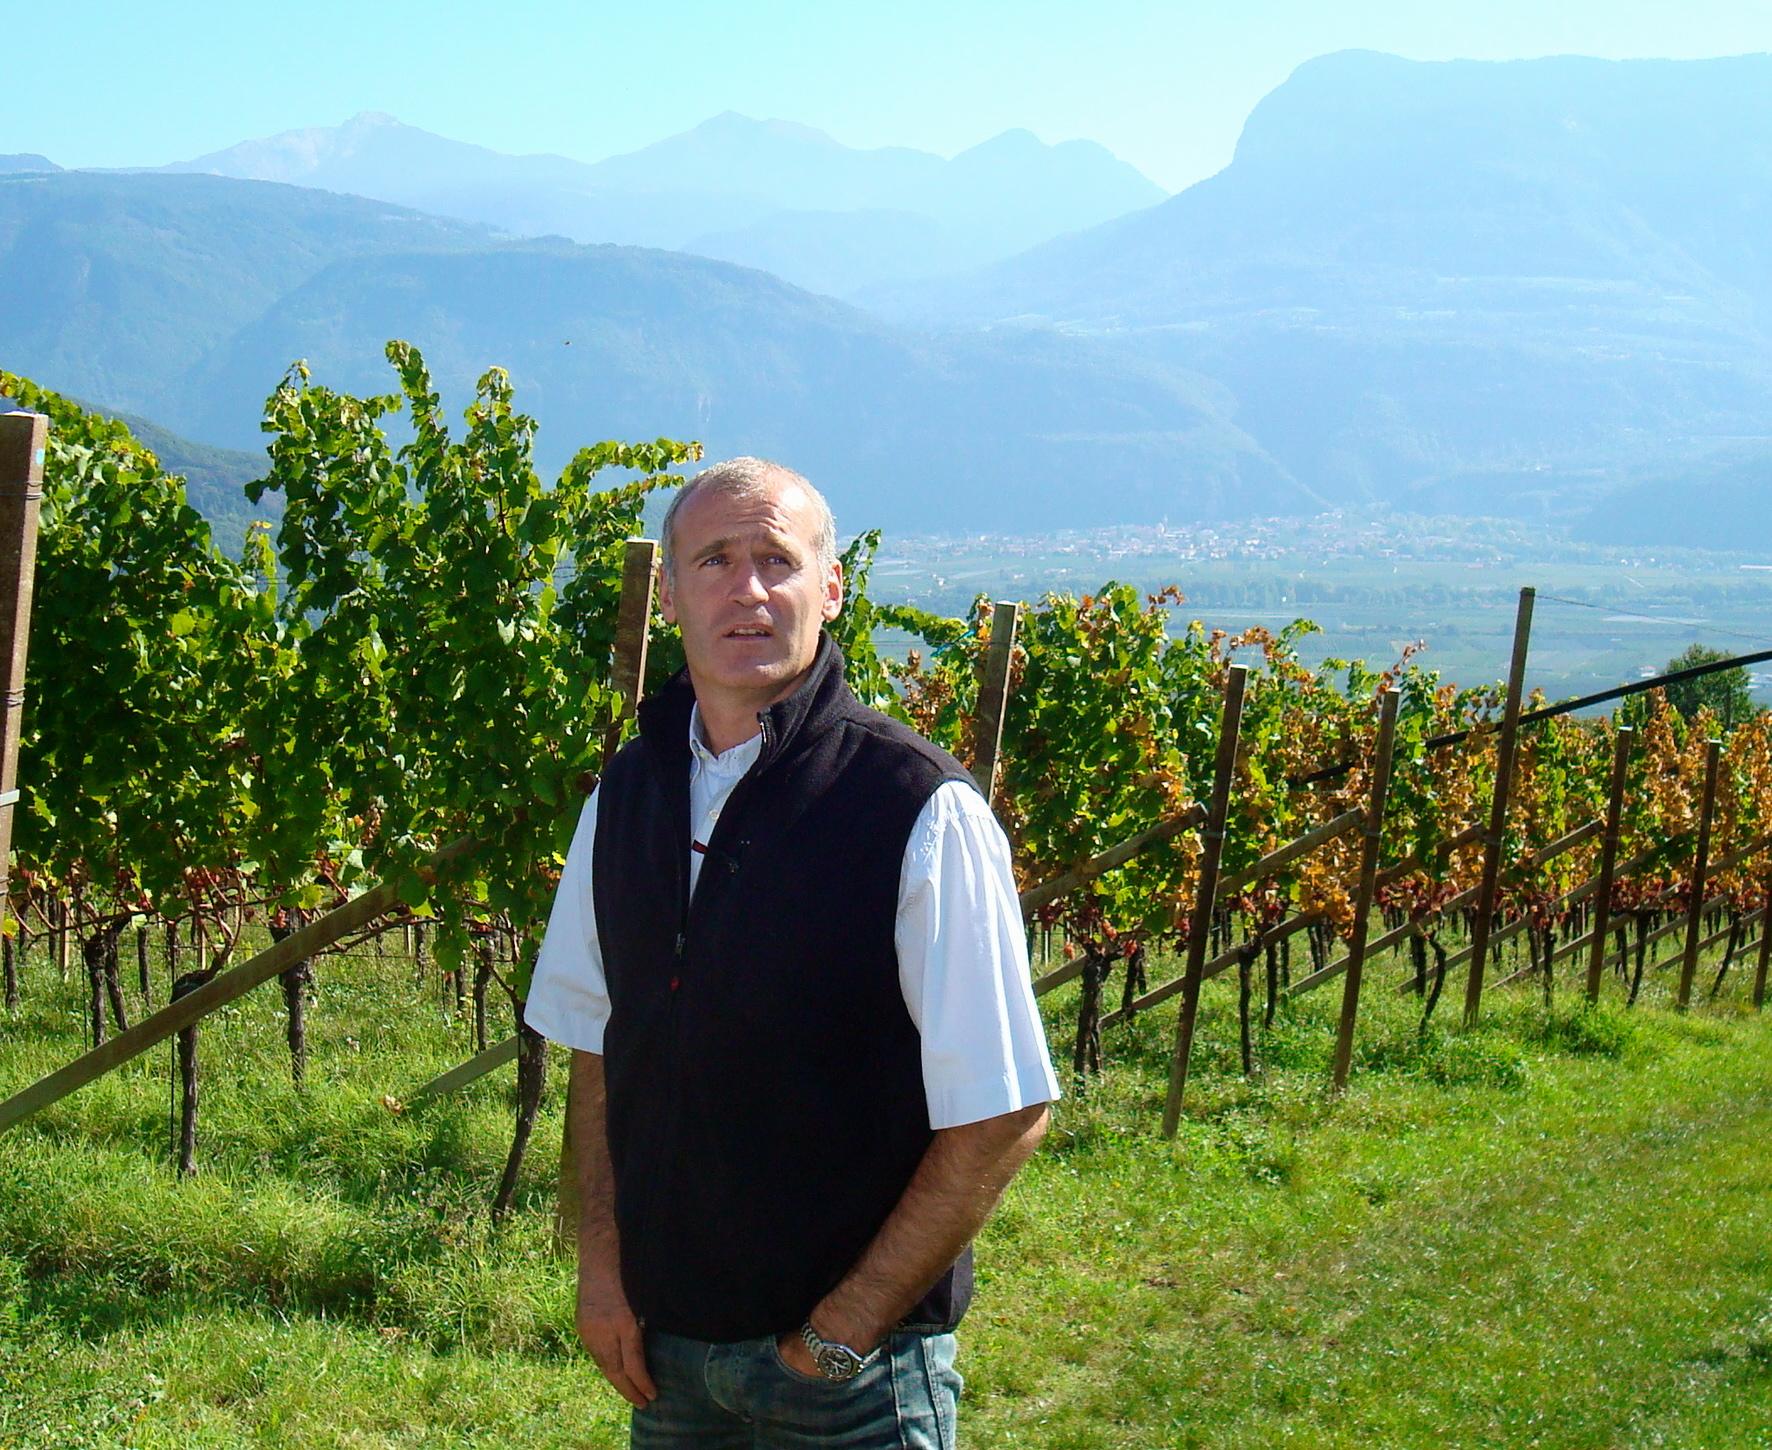 Willi Sturz in tramin vineyard